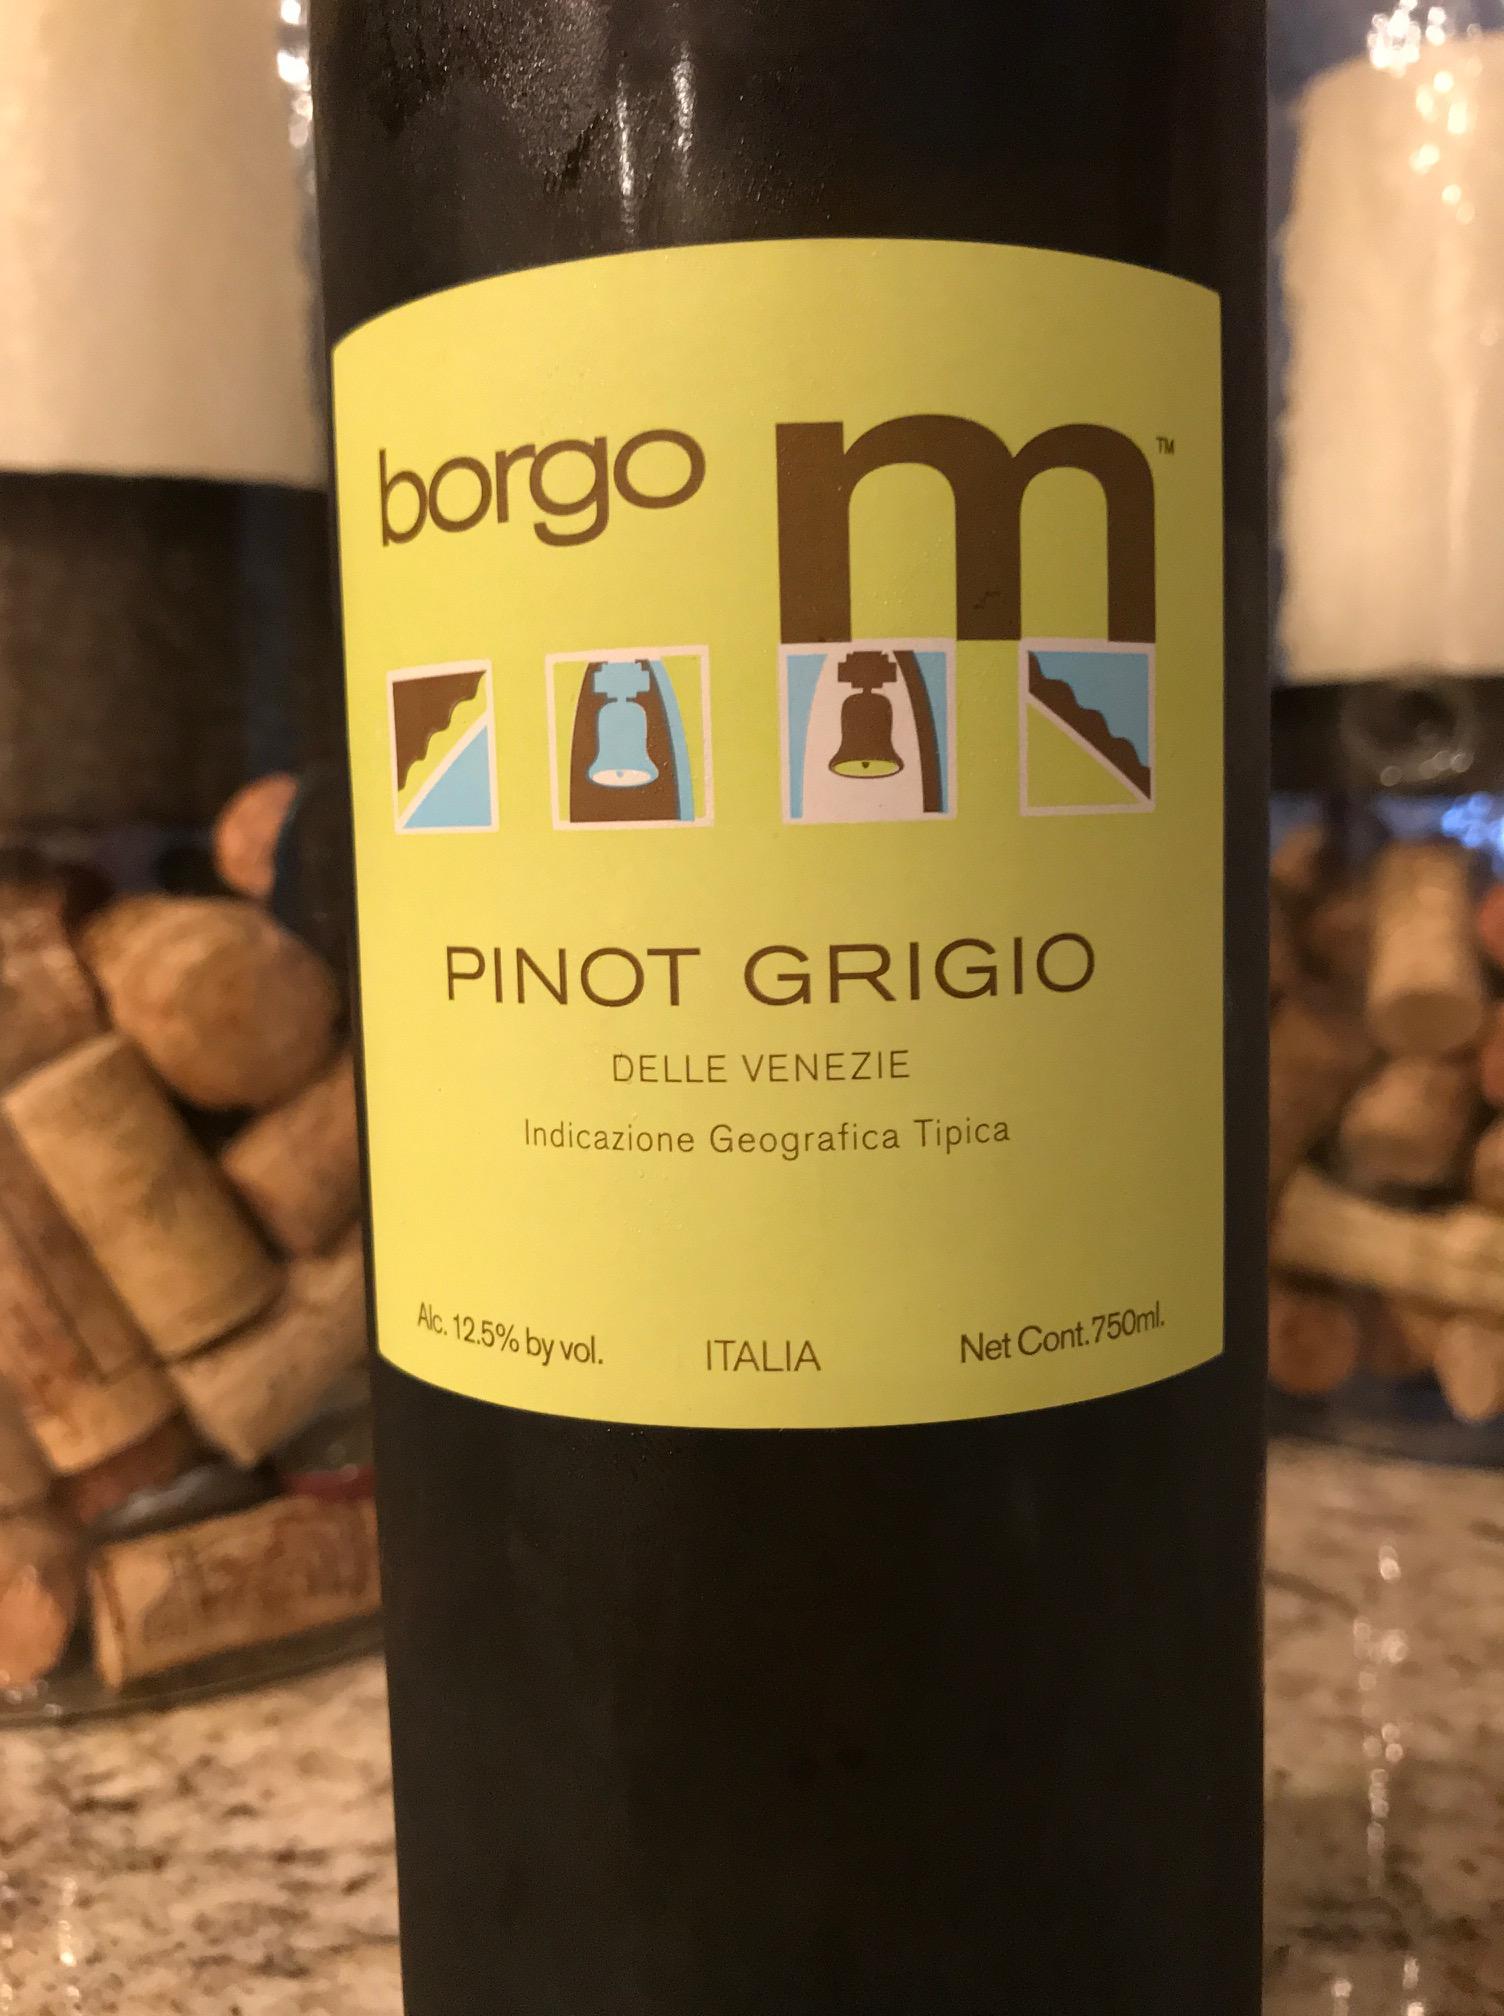 Grave del Friuli Pinot Grigio, Borgo Tesis, Fantinel